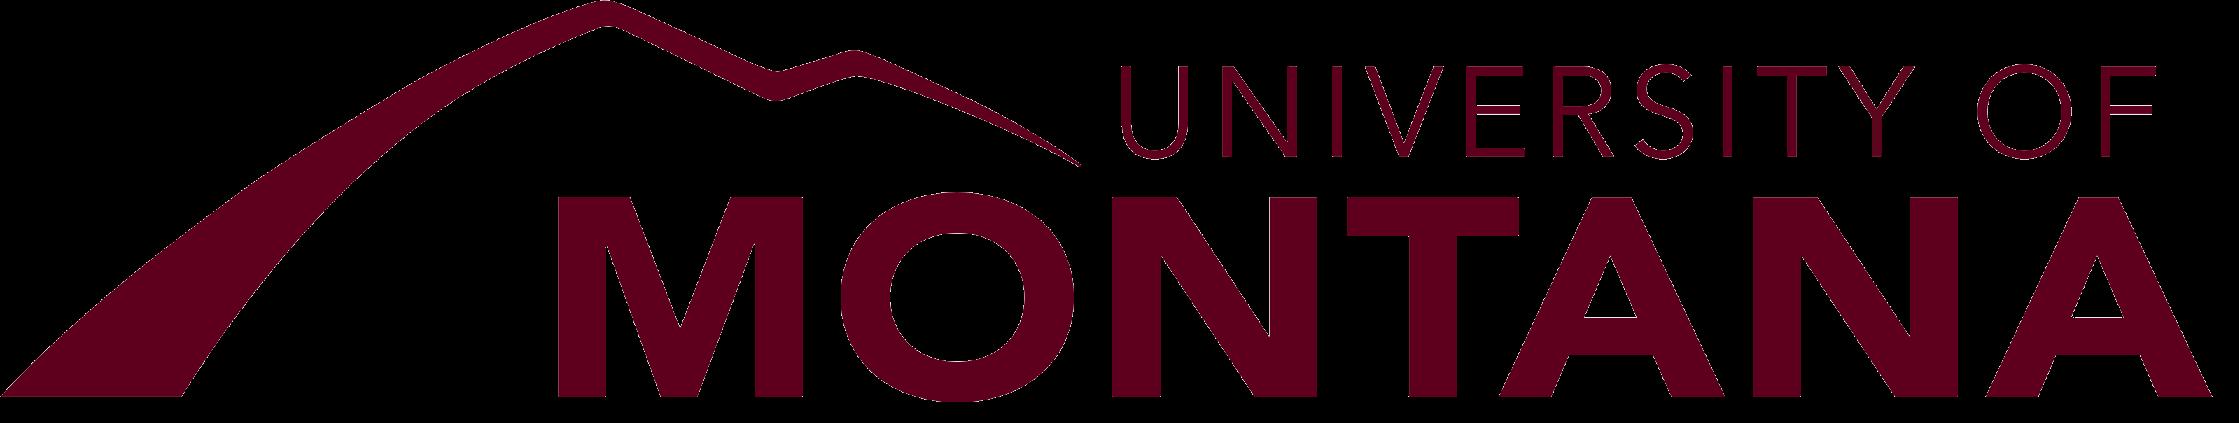 Logo of University of Montana